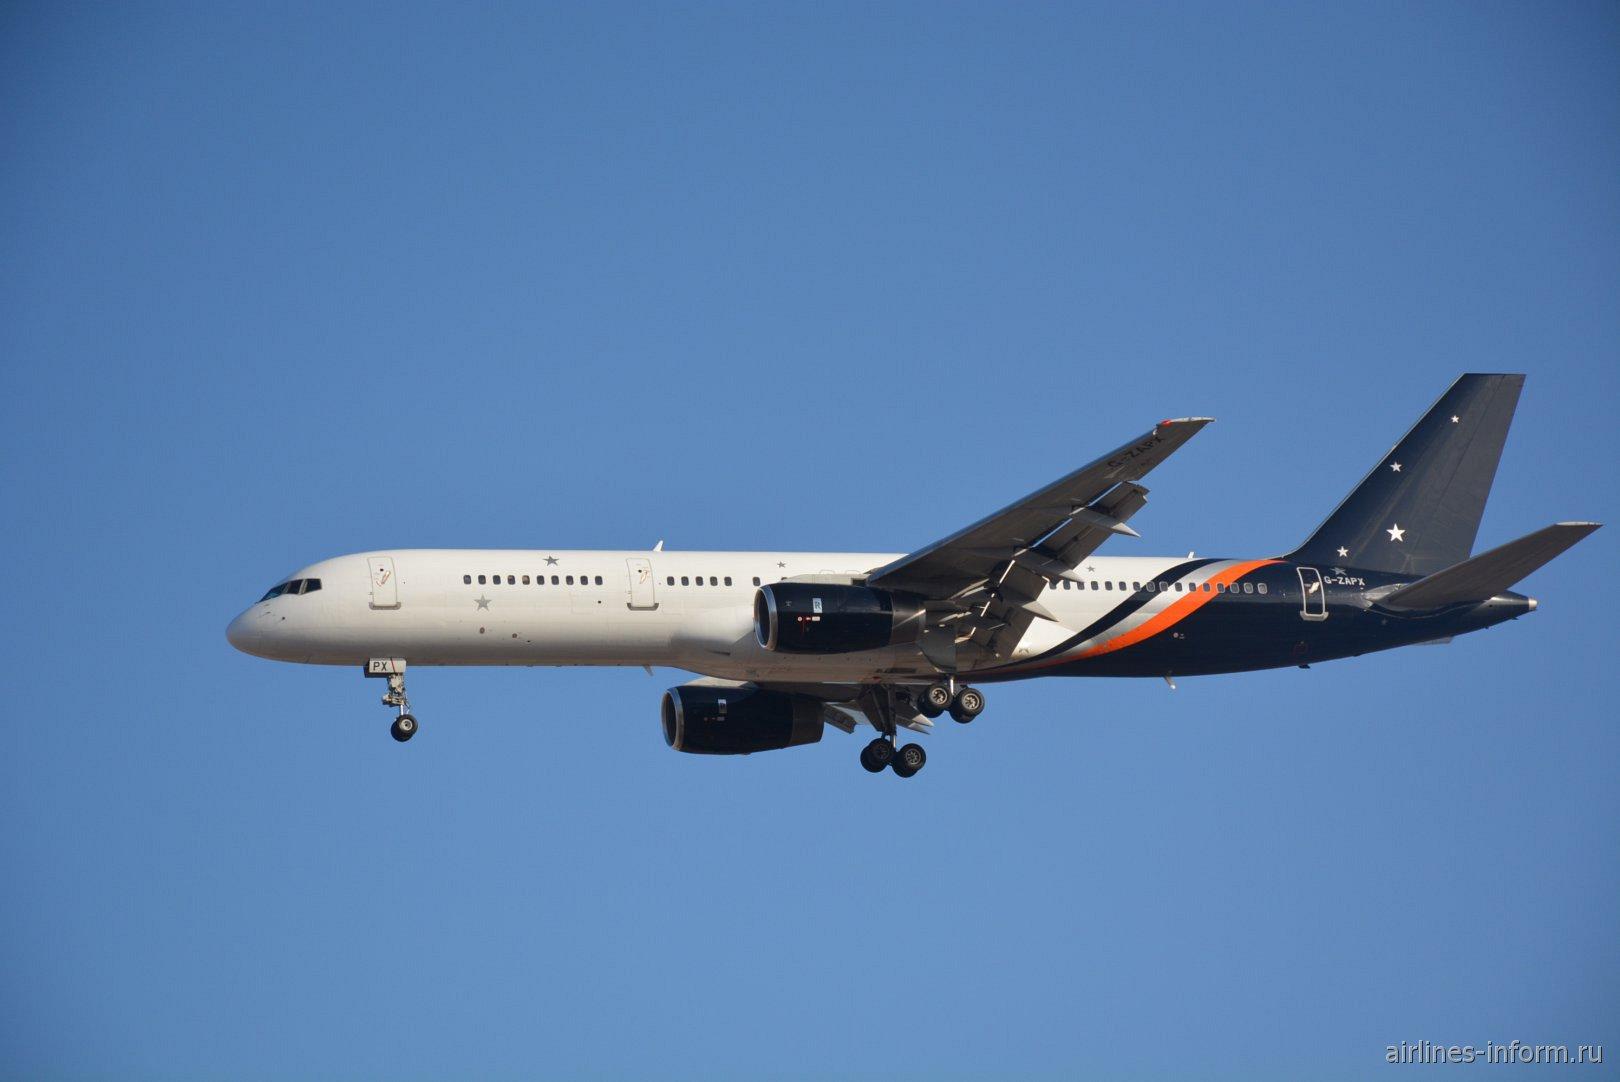 Боинг-757-200 номер G-ZAPX авиакомпании Titan Airways